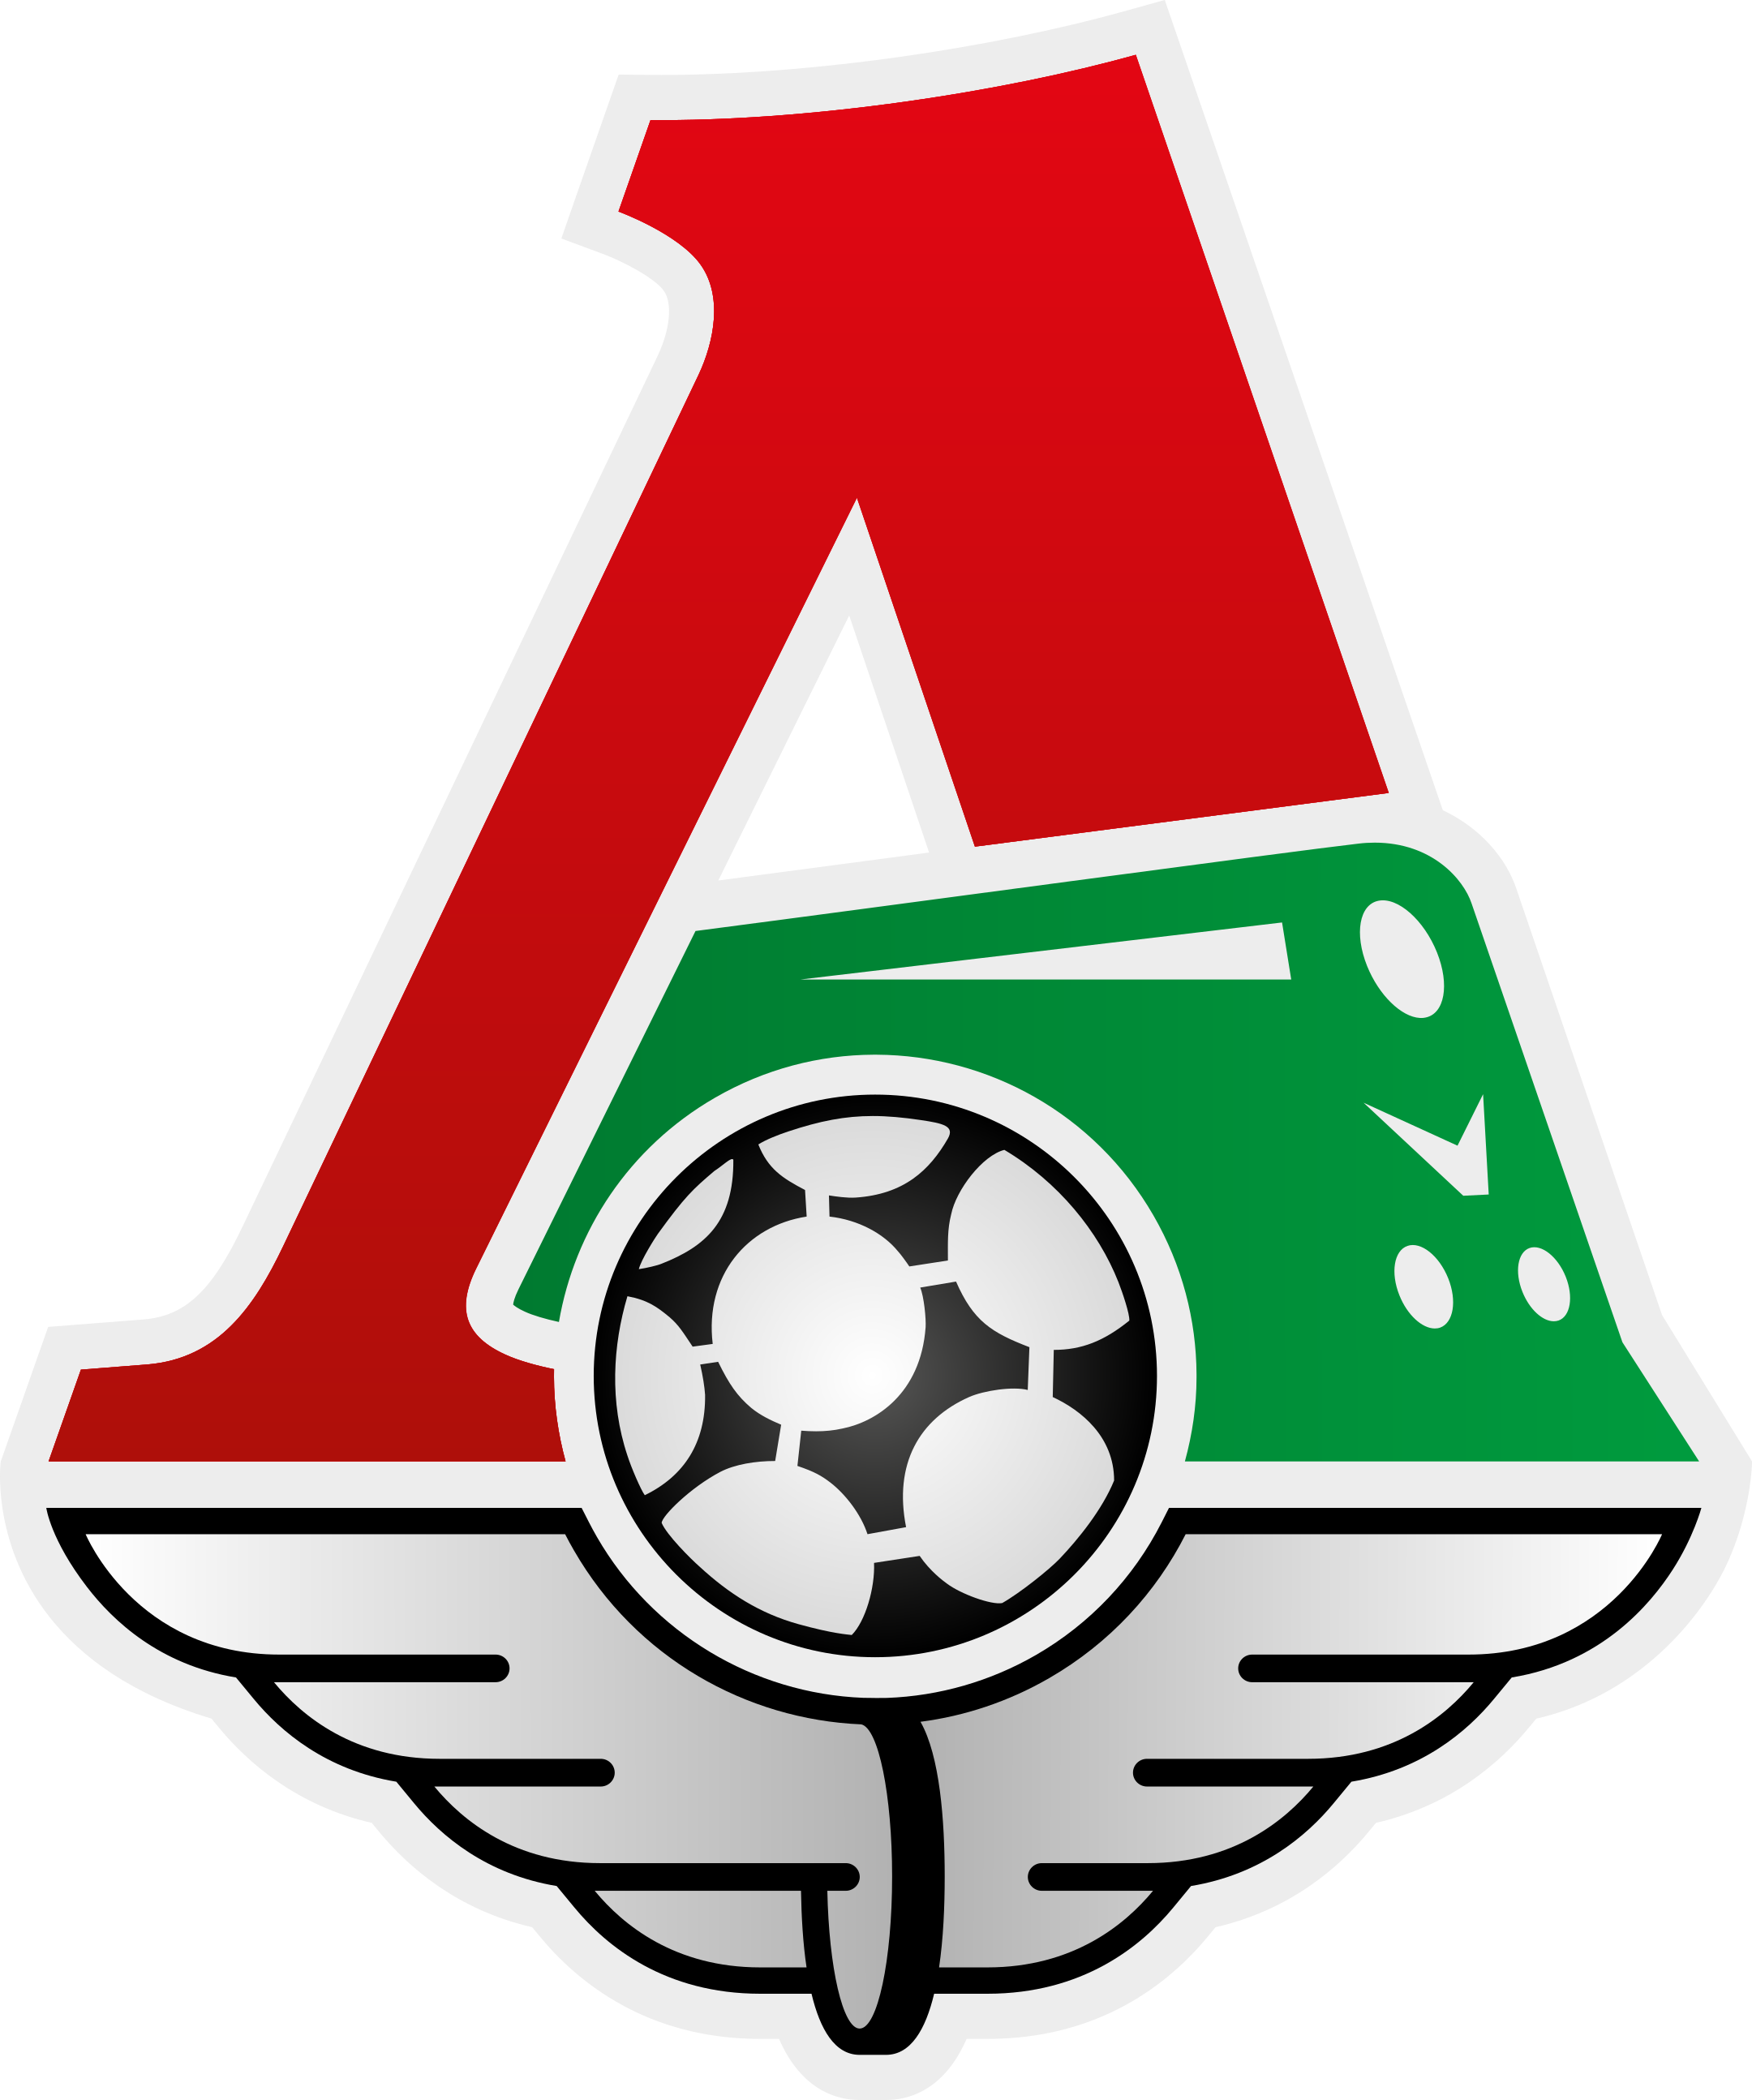 lokomotiv logo 1 - FC Lokomotiv Moscú Logo